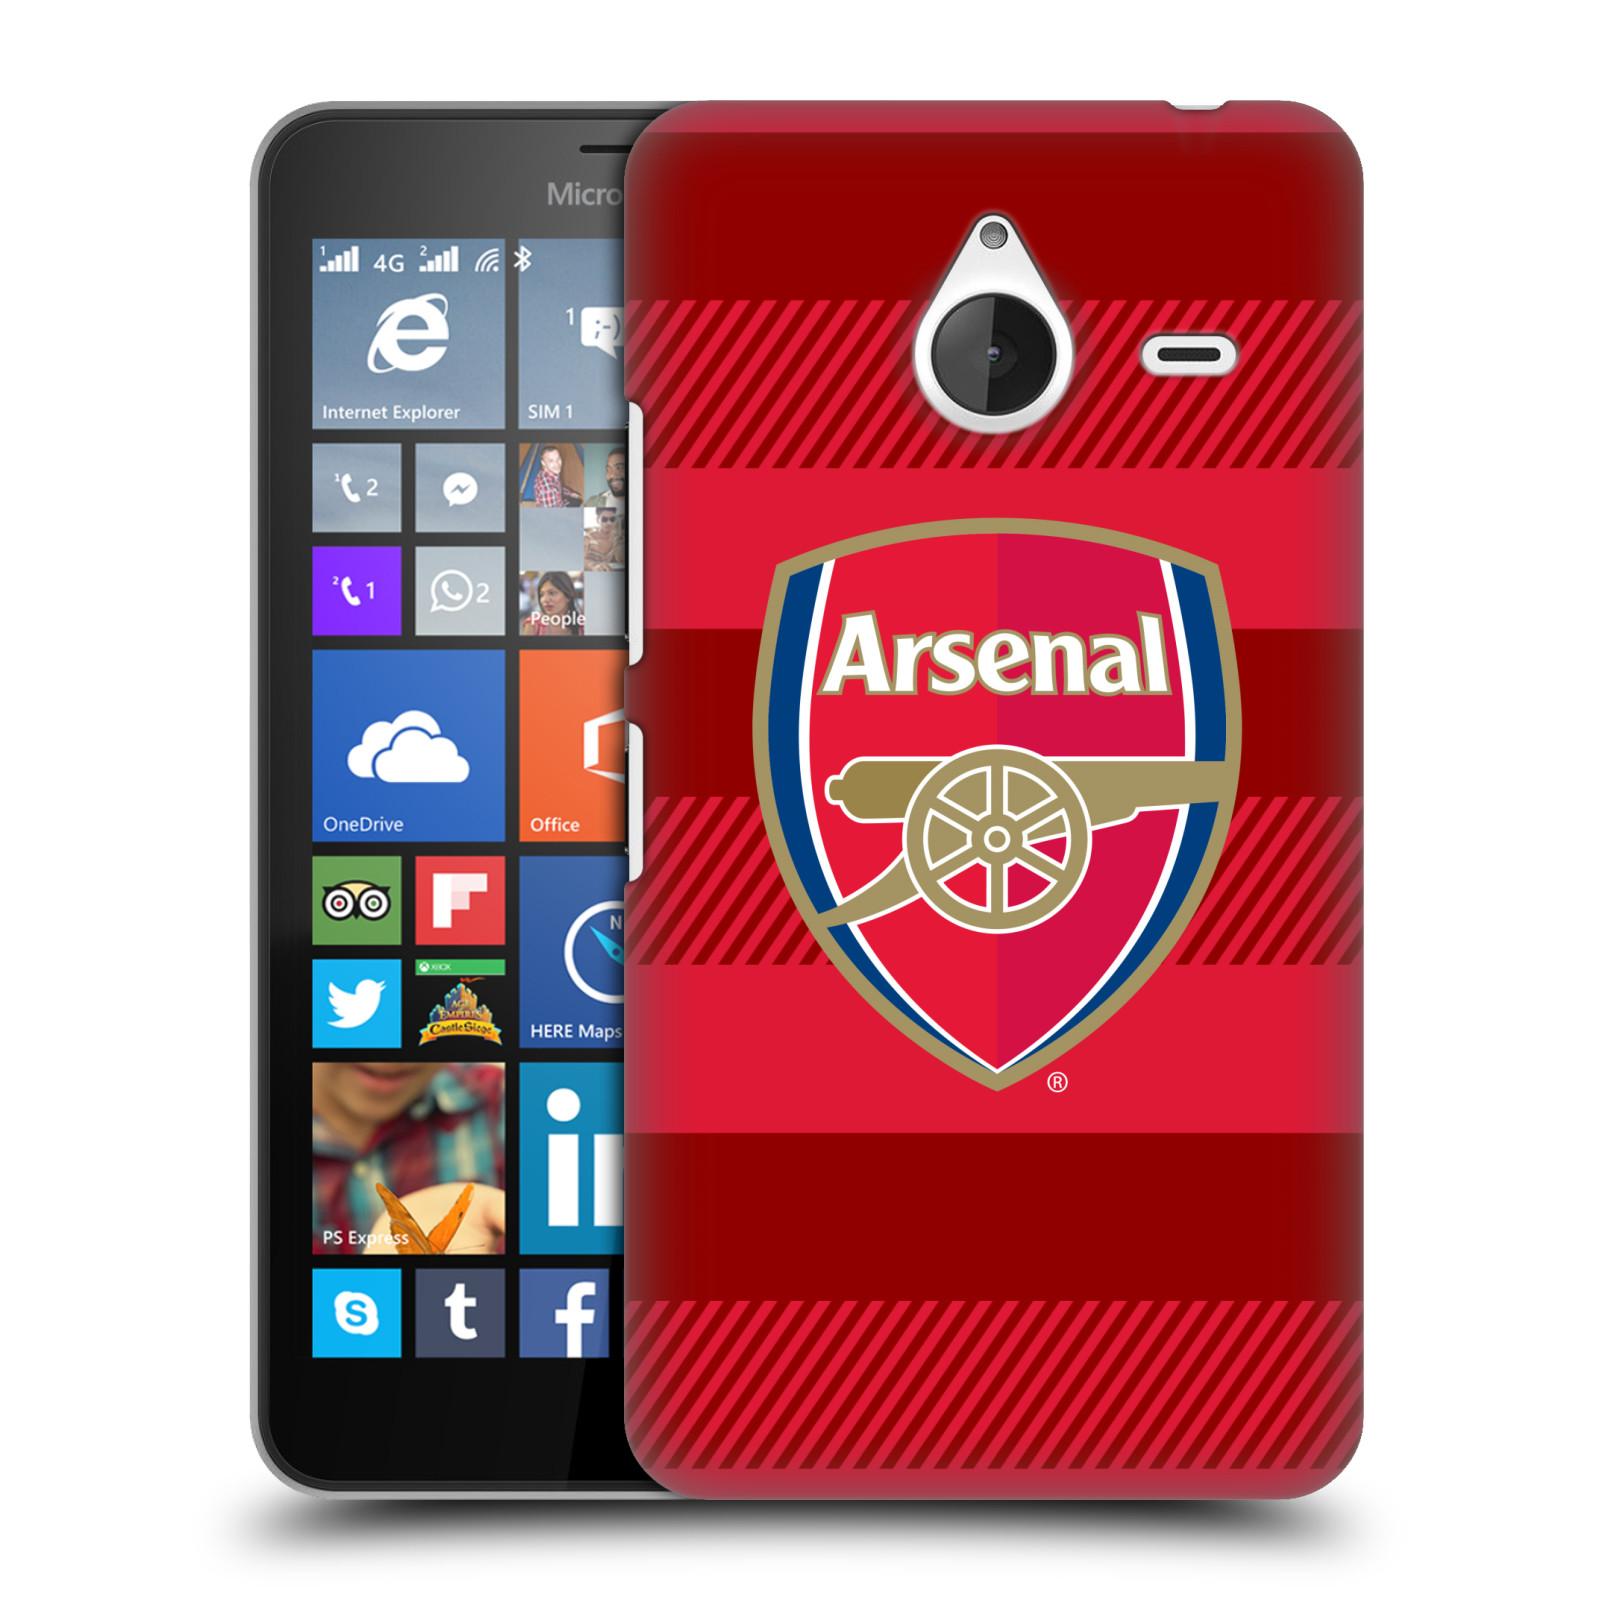 Plastové pouzdro na mobil Microsoft Lumia 640 XL - Head Case - Arsenal FC - Logo s pruhy